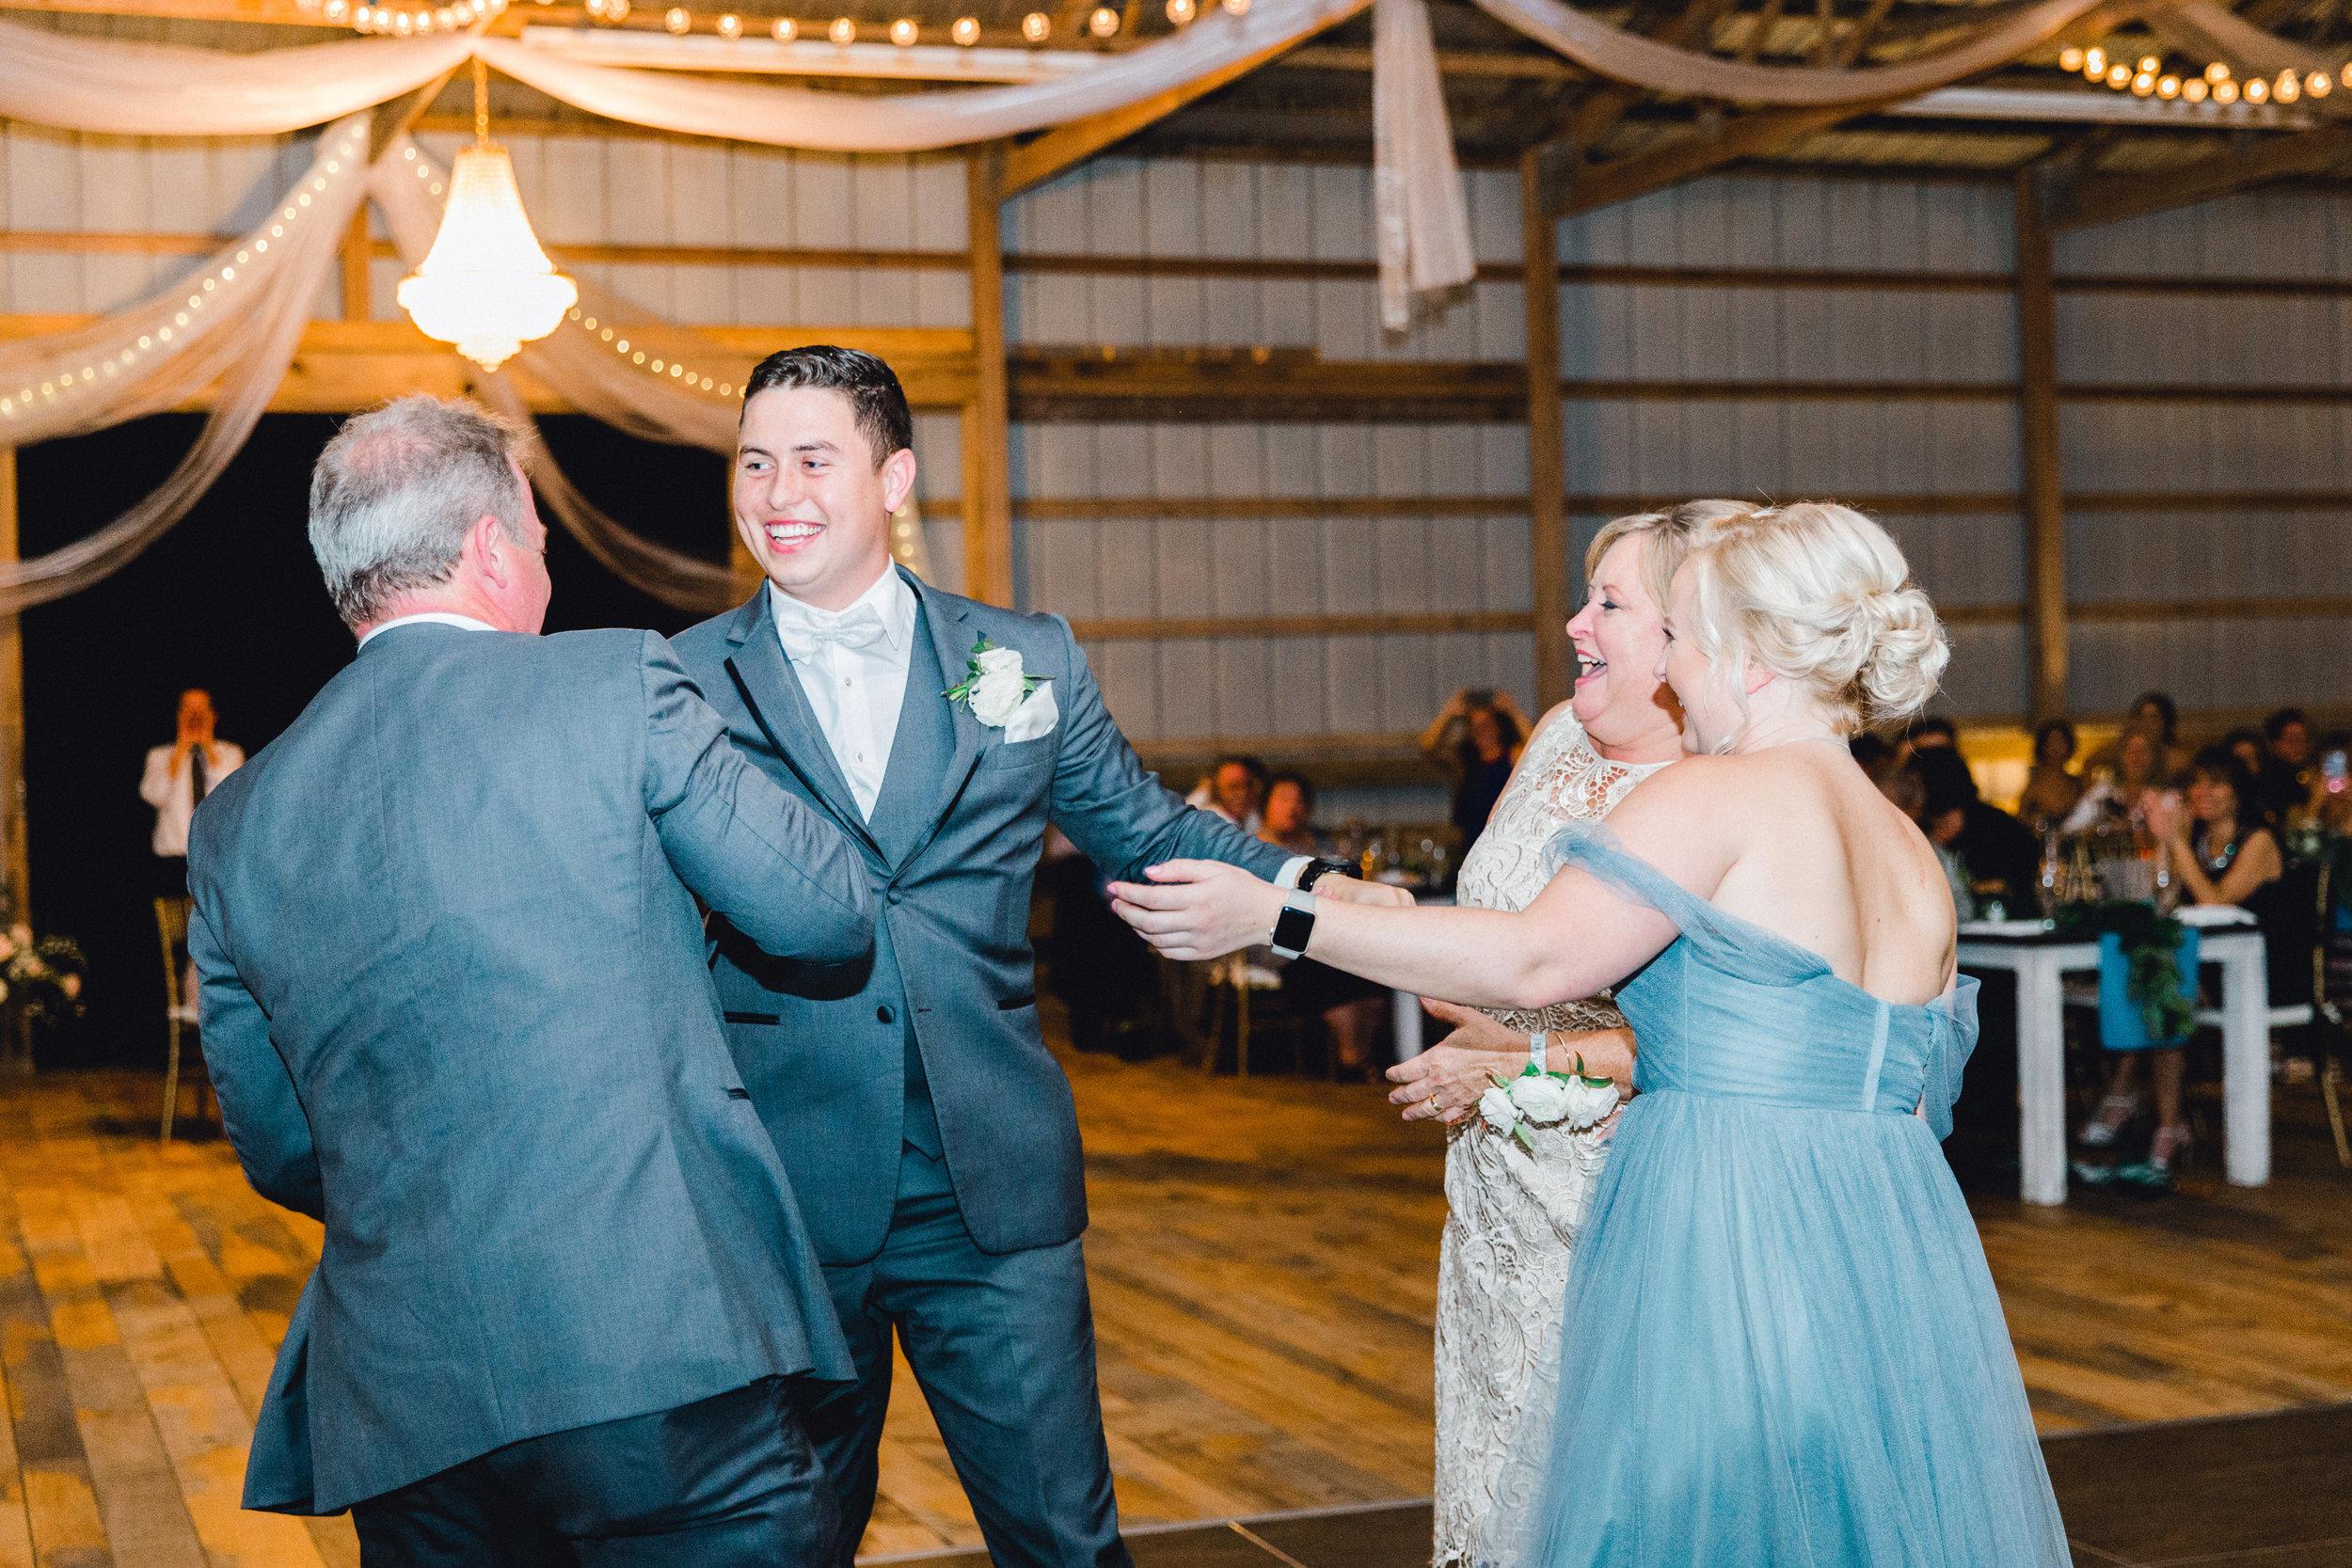 Paige-Mercer-Photography-Florida-Wedding-Photographer-Alyssa&Drew-85.jpg